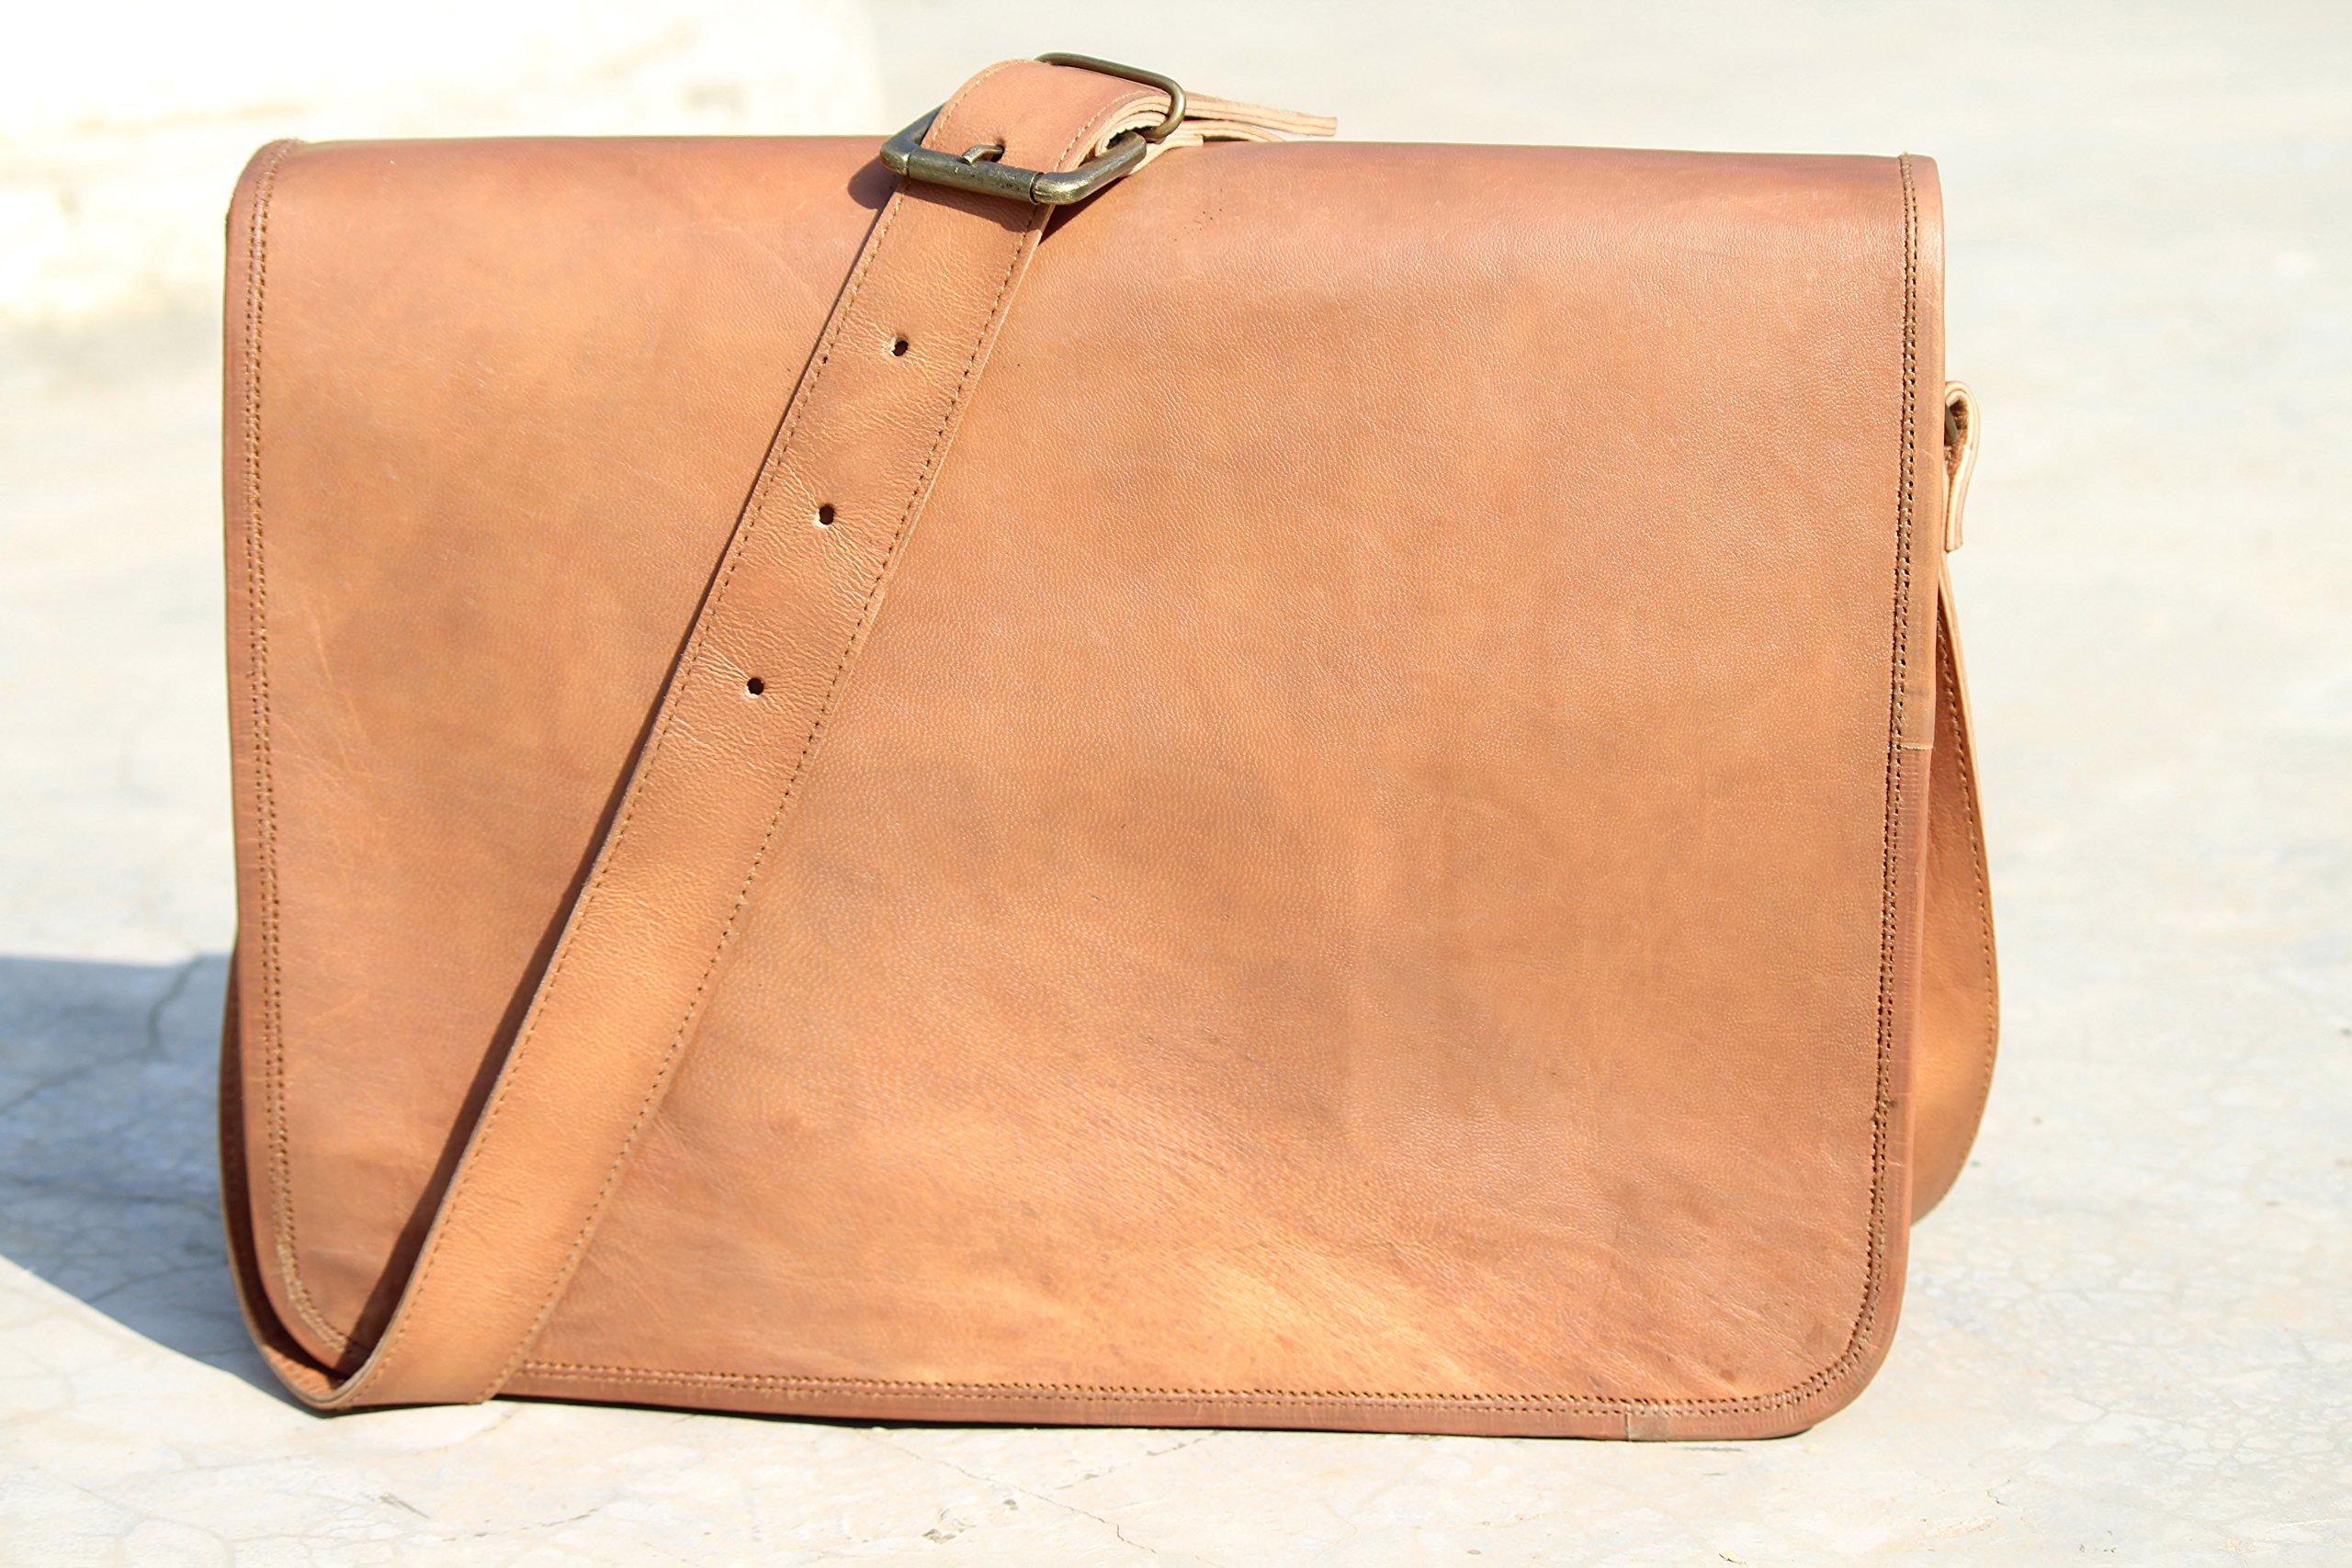 Leather Full Flap Messenger Handmade Bag School Bag15X11X4 Inches Brown